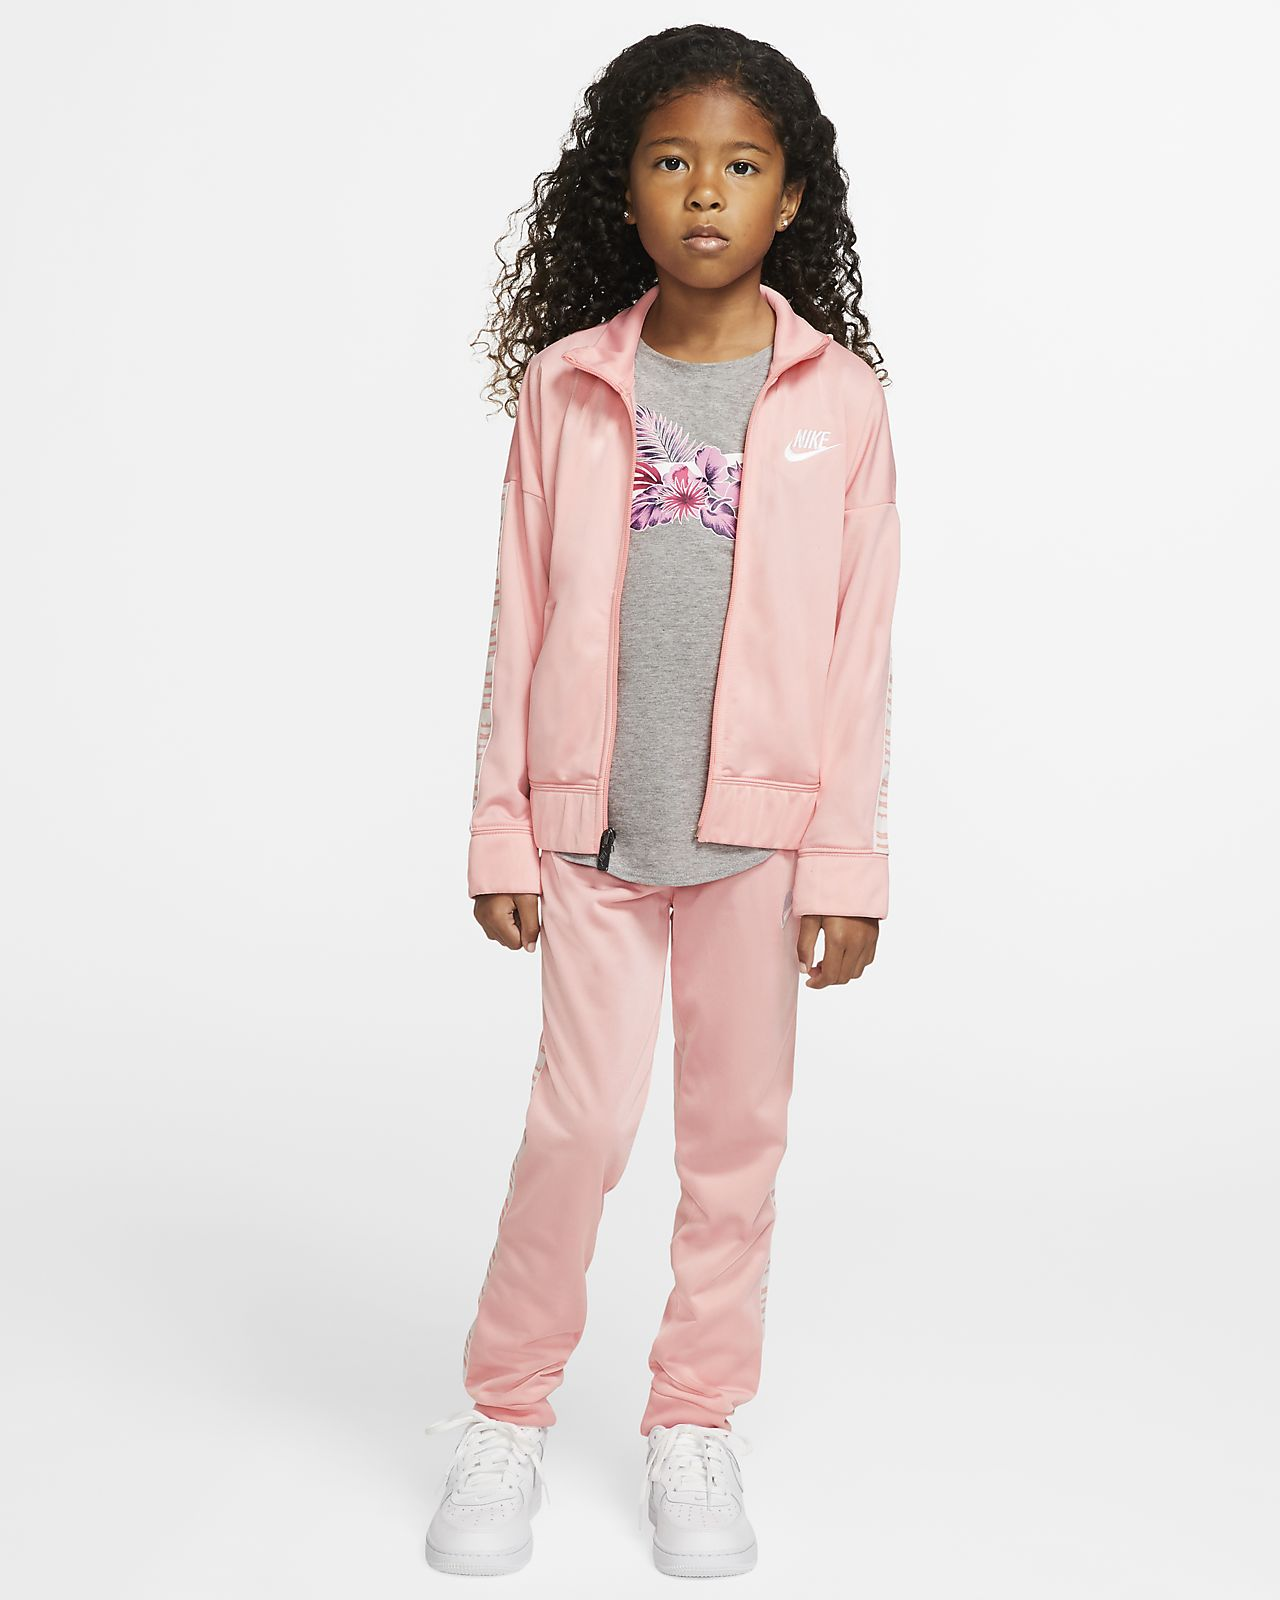 Nike Sportswear Xandall - Nen/a petit/a